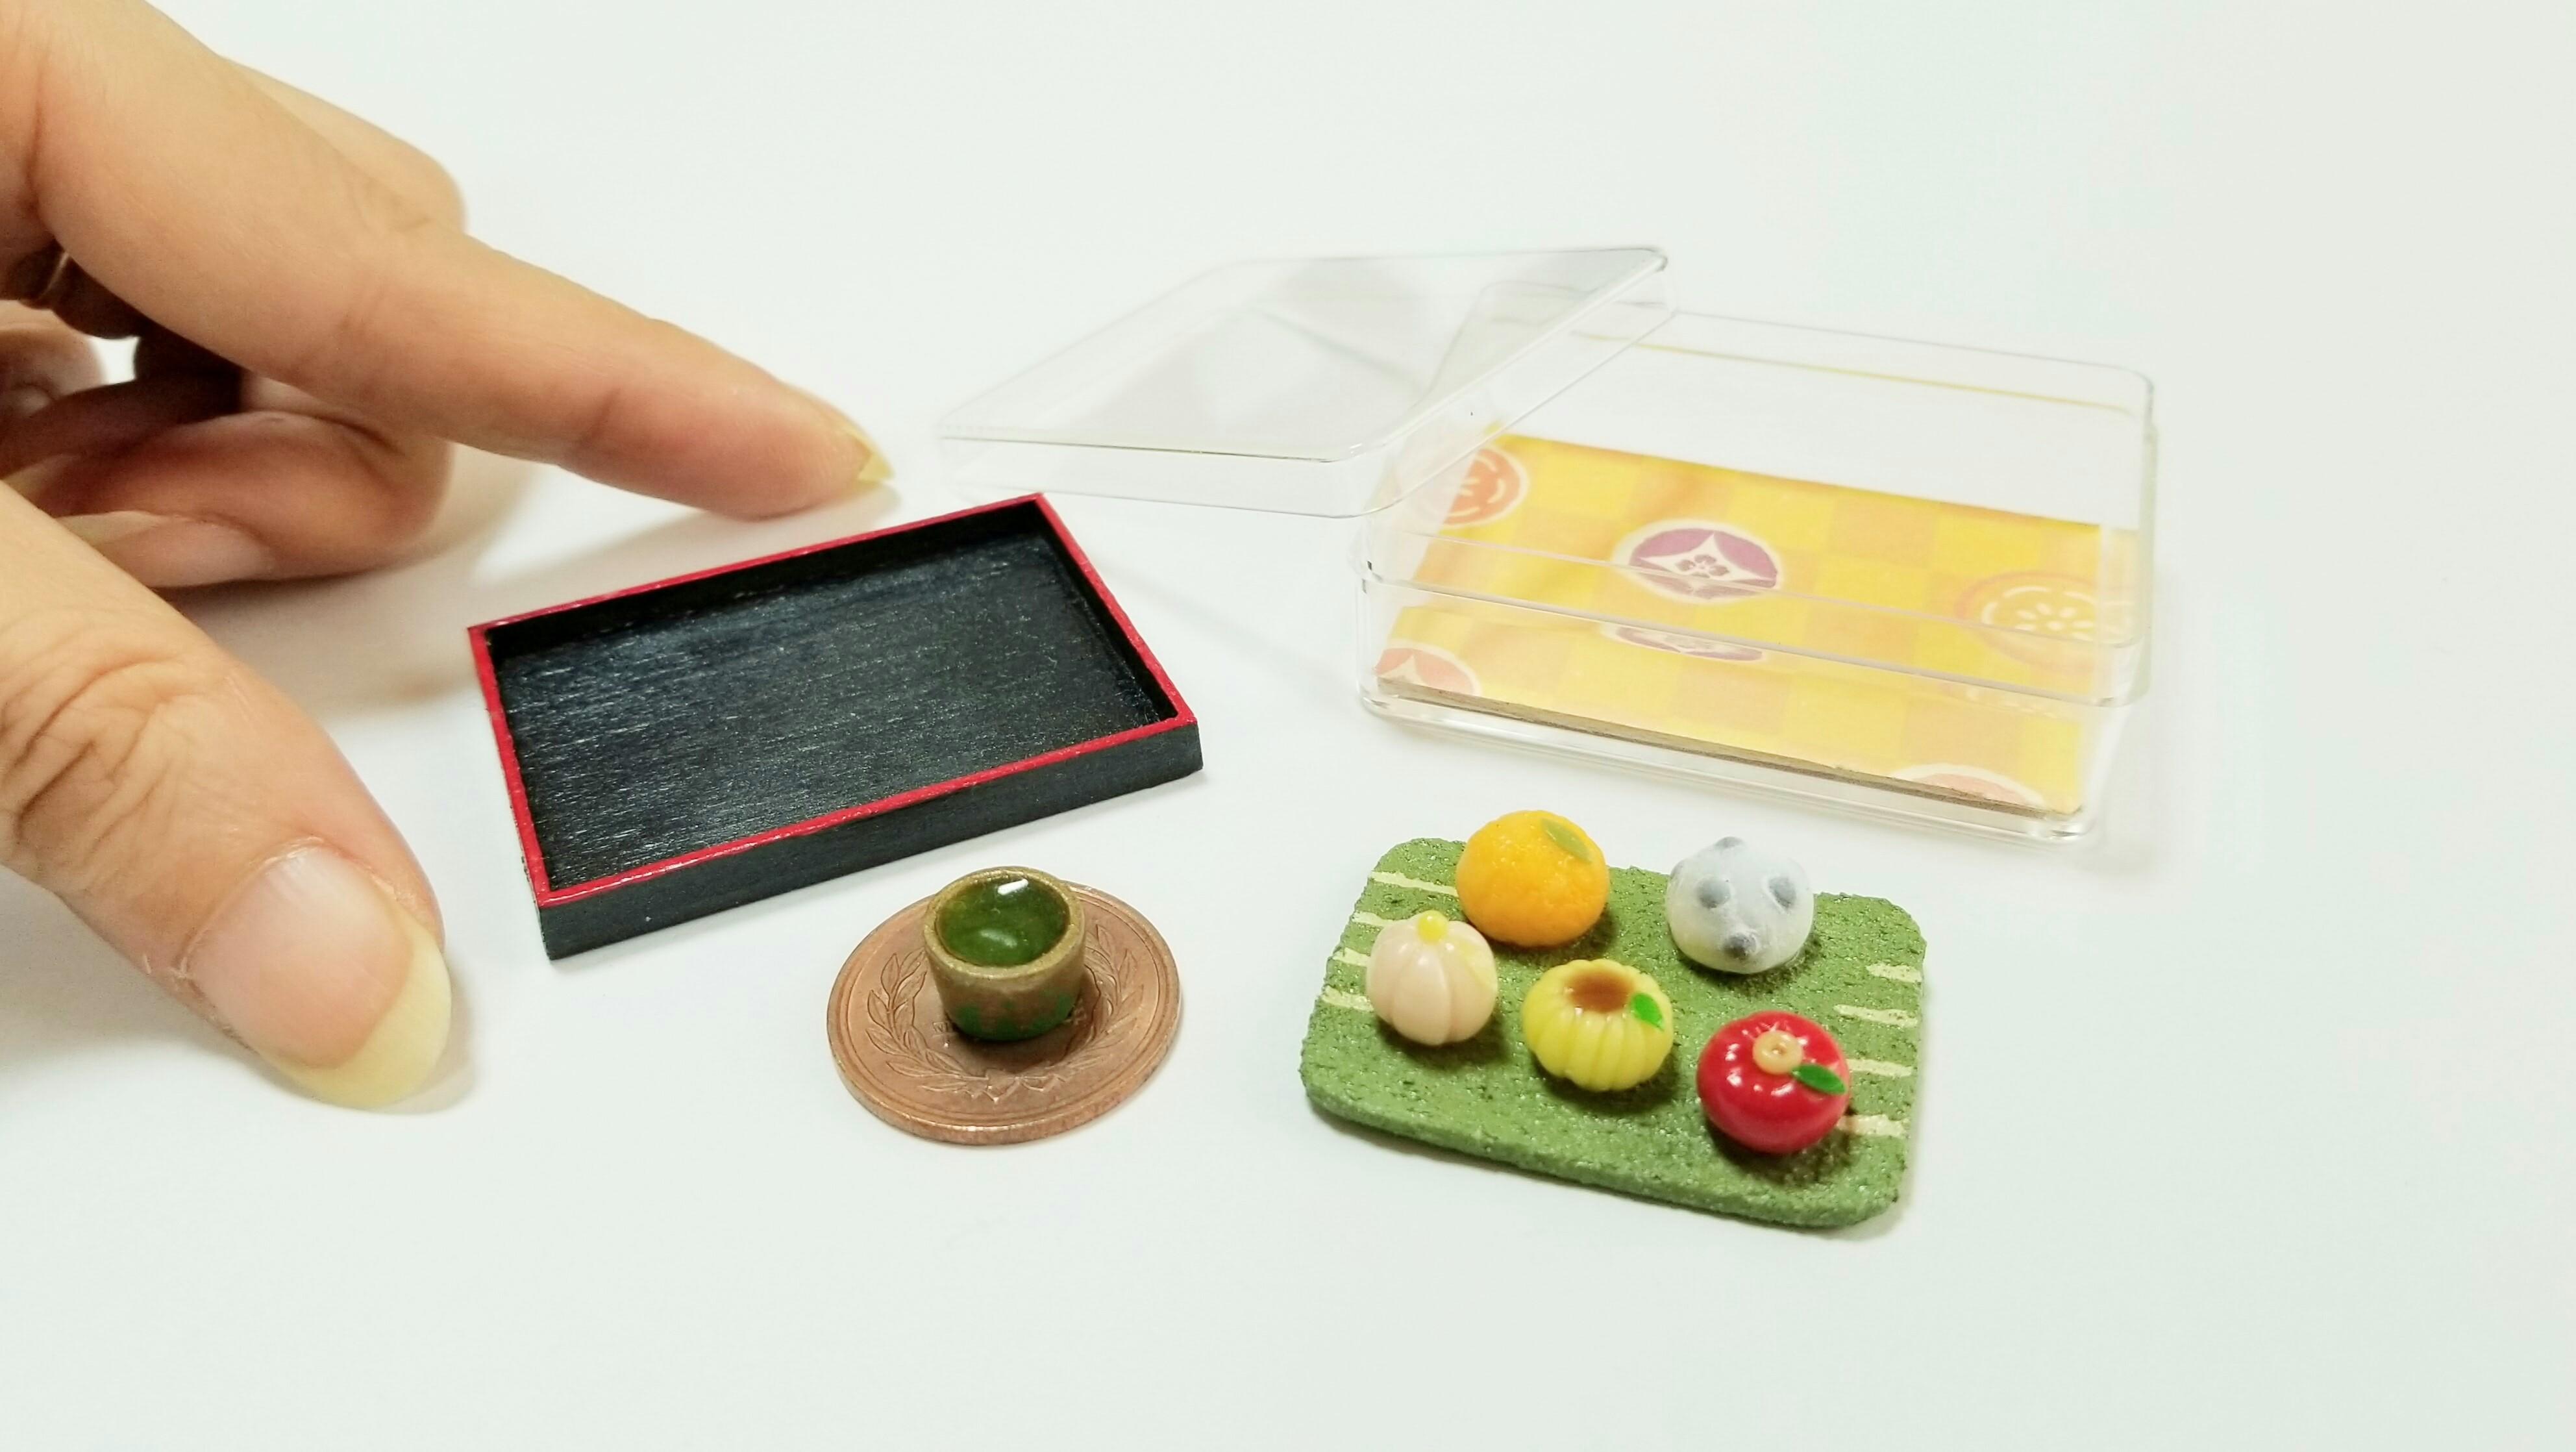 miniaturefoodspolymerclayartdollhousekawaiijapanesesweetwagashi